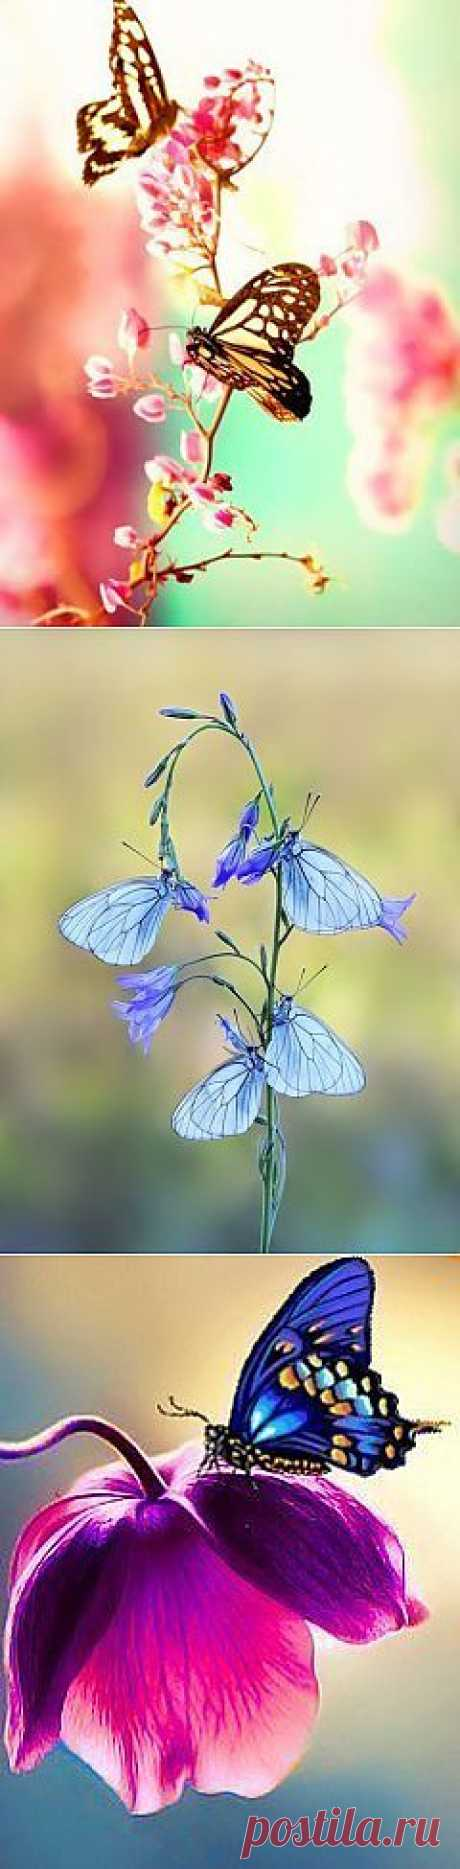 Дыхание жизни: чудо бабочки